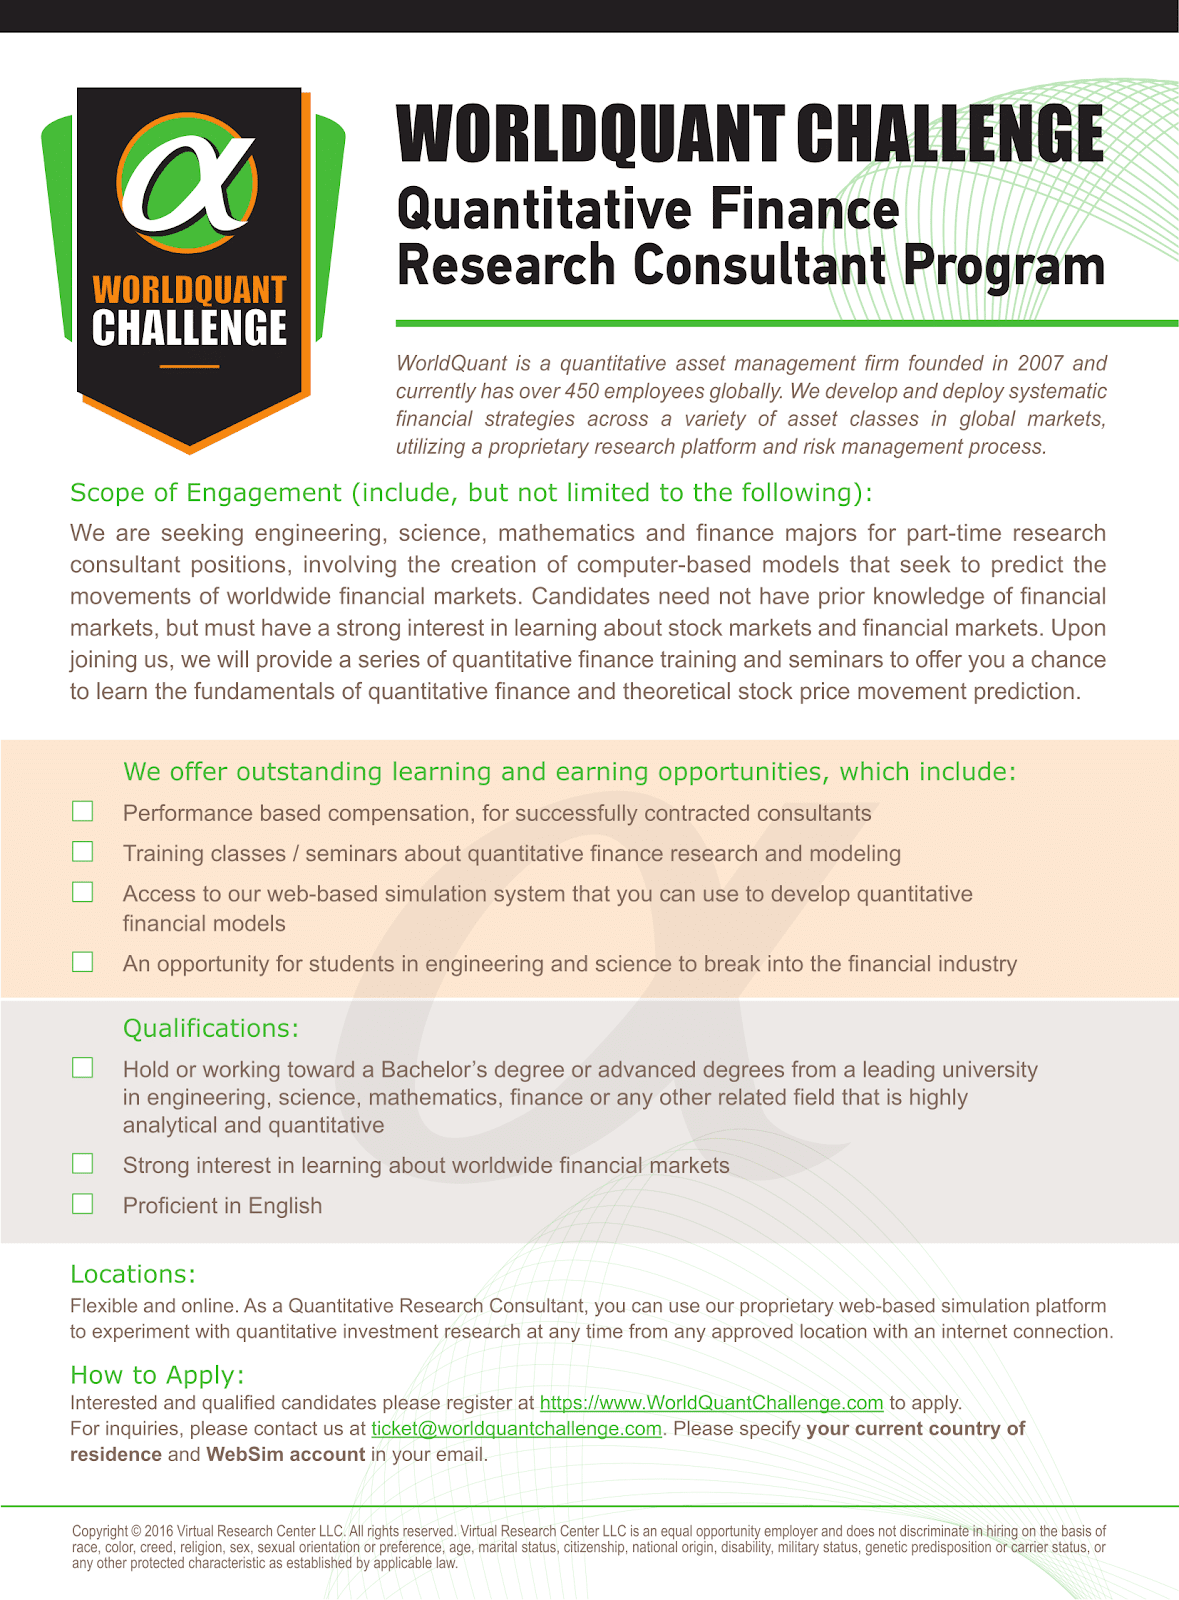 NHVL] WorldQuant Challenge - Quantitative Finanace & Research